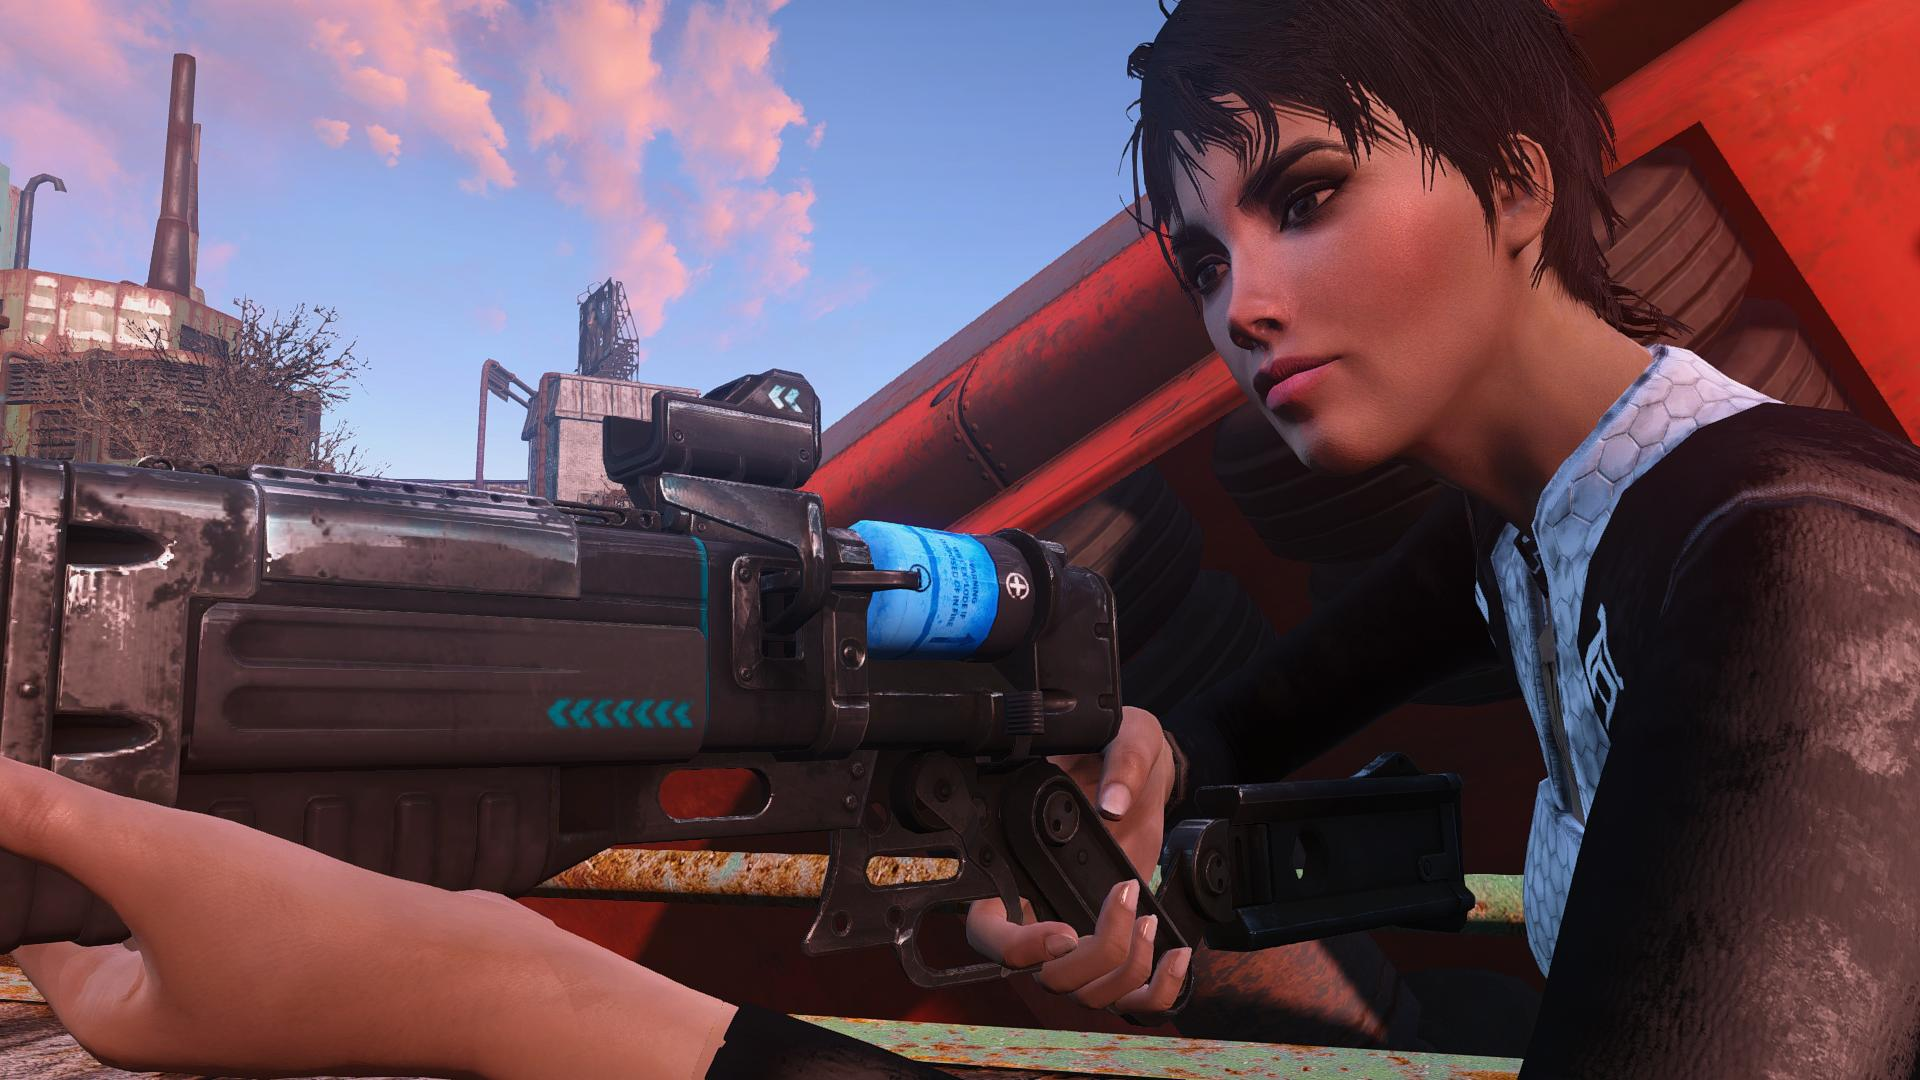 000496.Jpg - Fallout 4